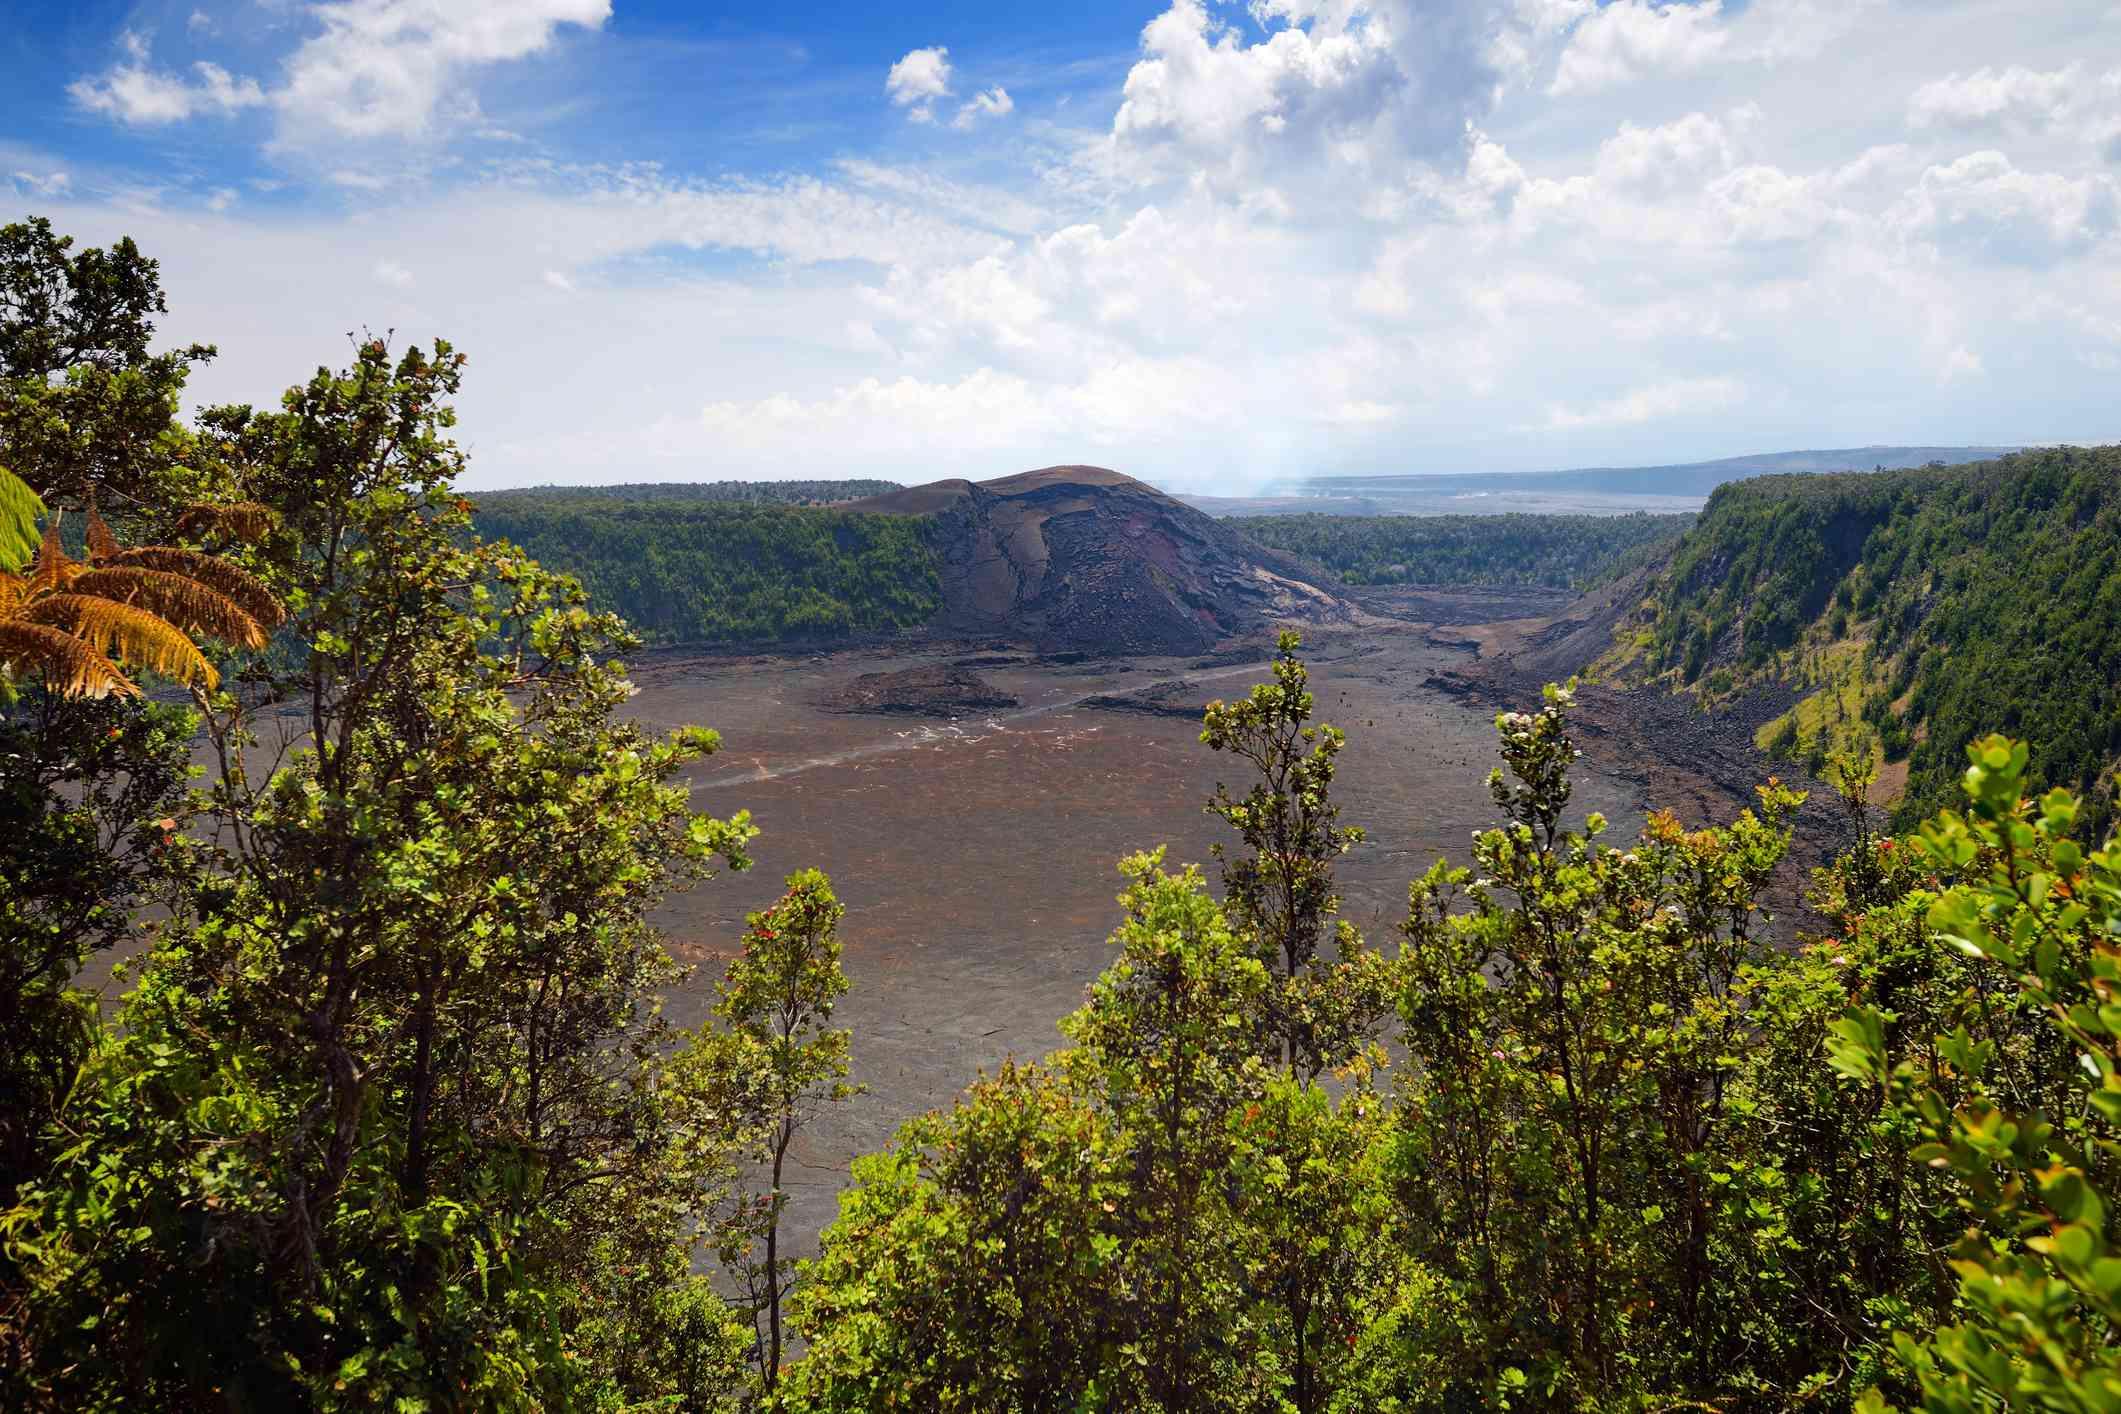 A view of Kilauea Iki trail on Hawaii Island